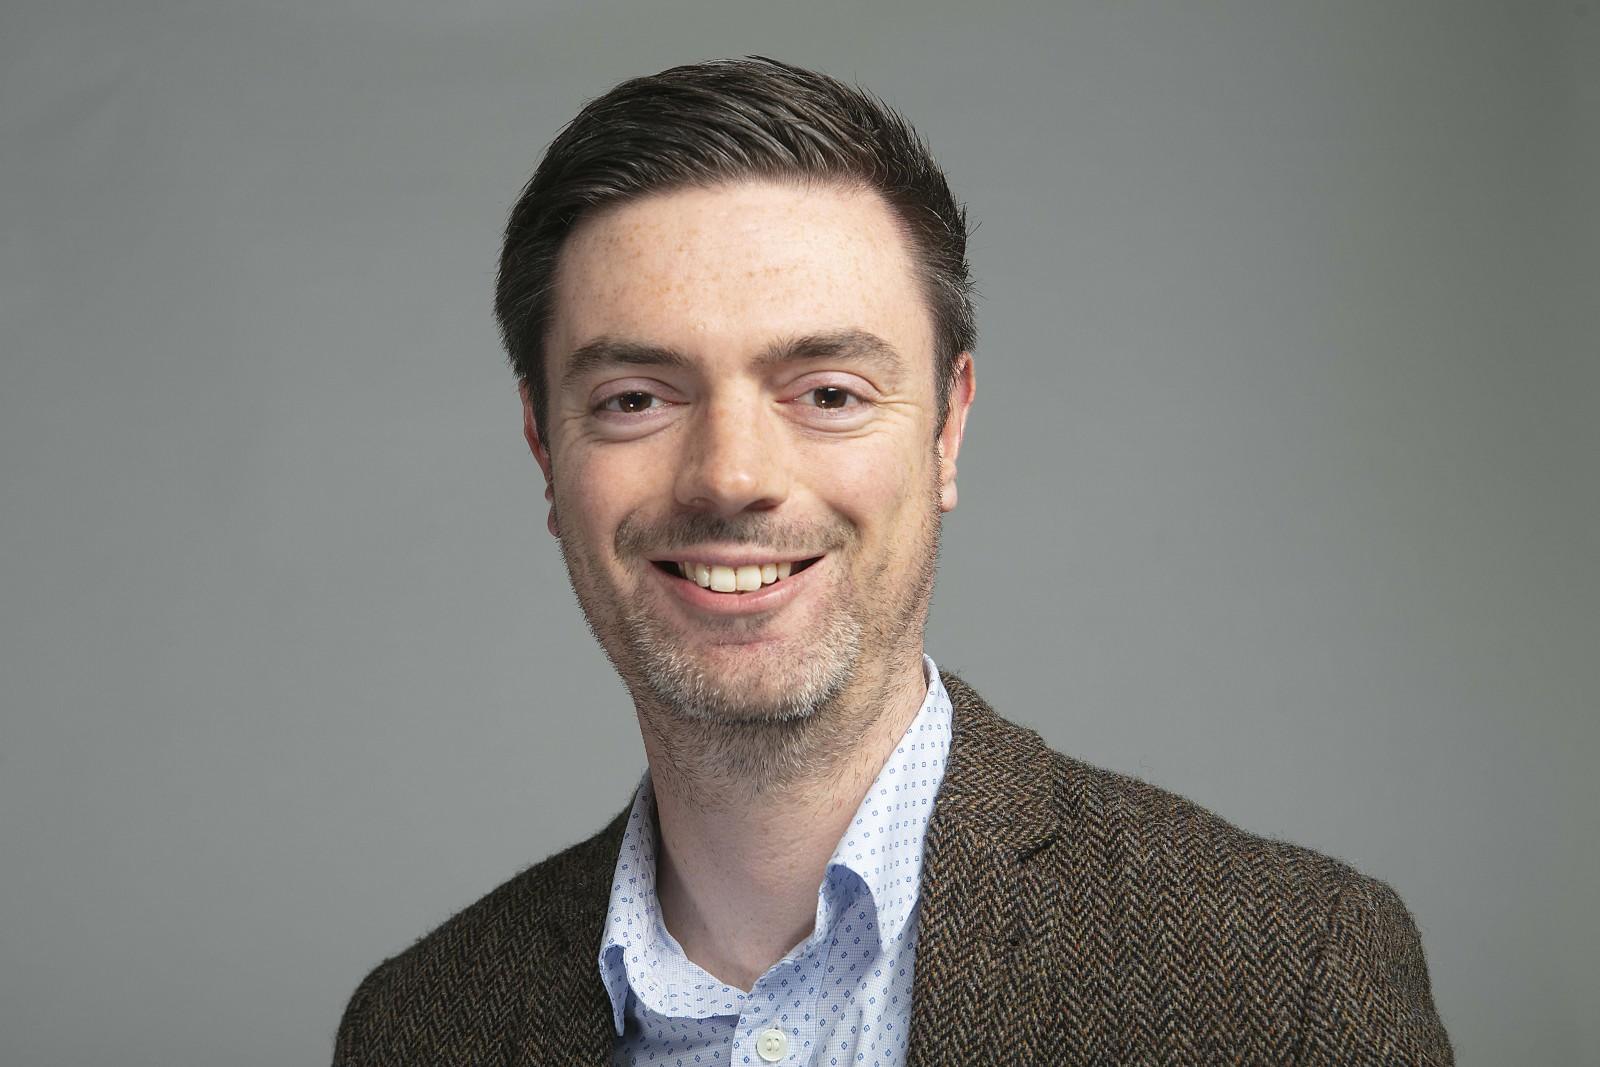 Dr Jake Morris-Campbell